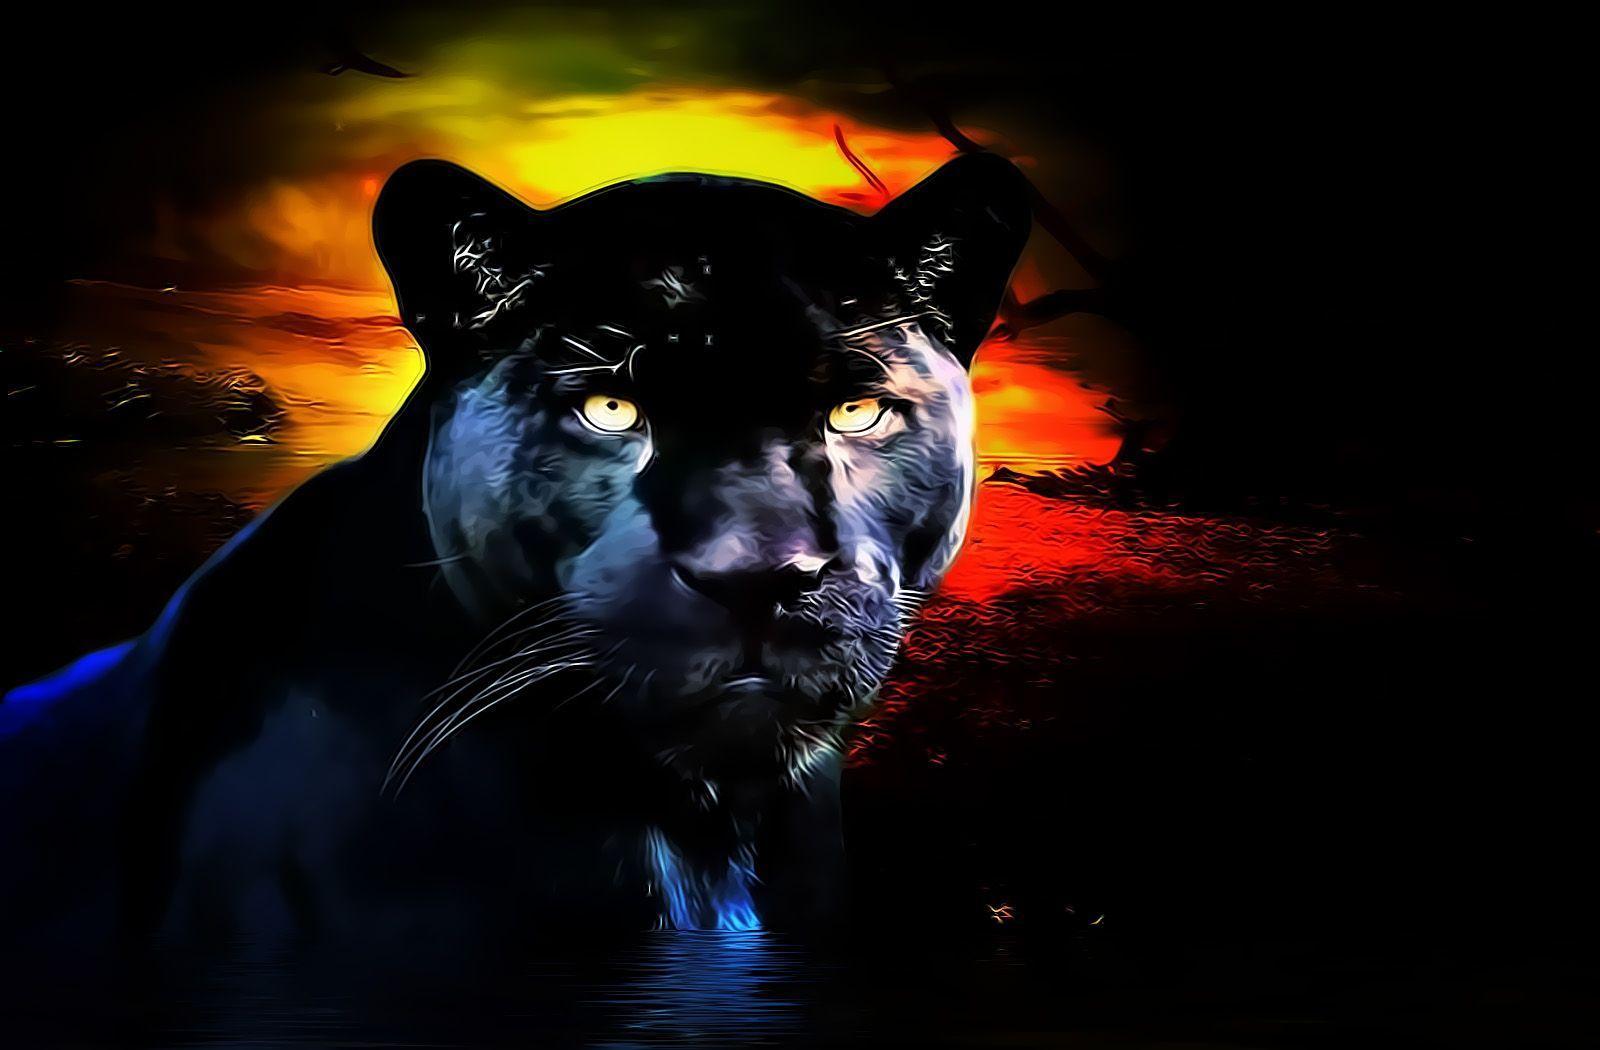 Kool HD Desktop Black Panther Wallpaper Black panther hd